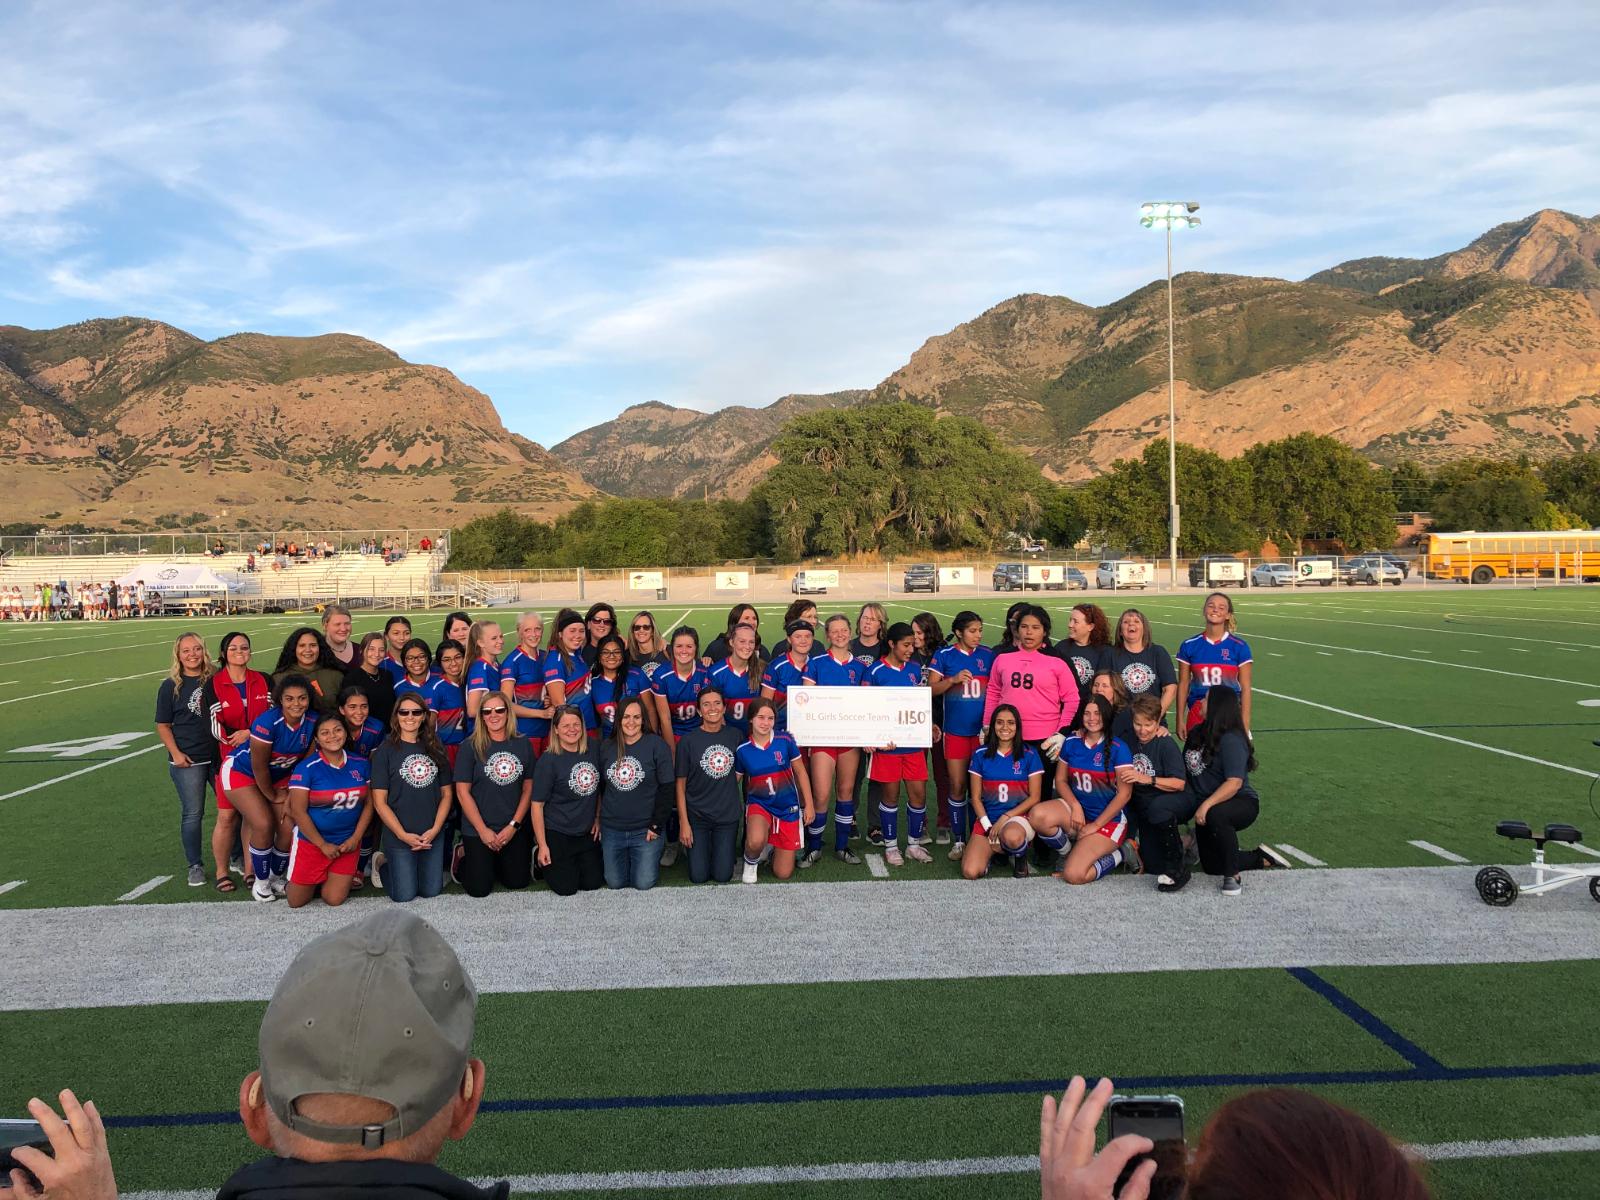 Return of the '89 State Champion Girls Soccer Team!